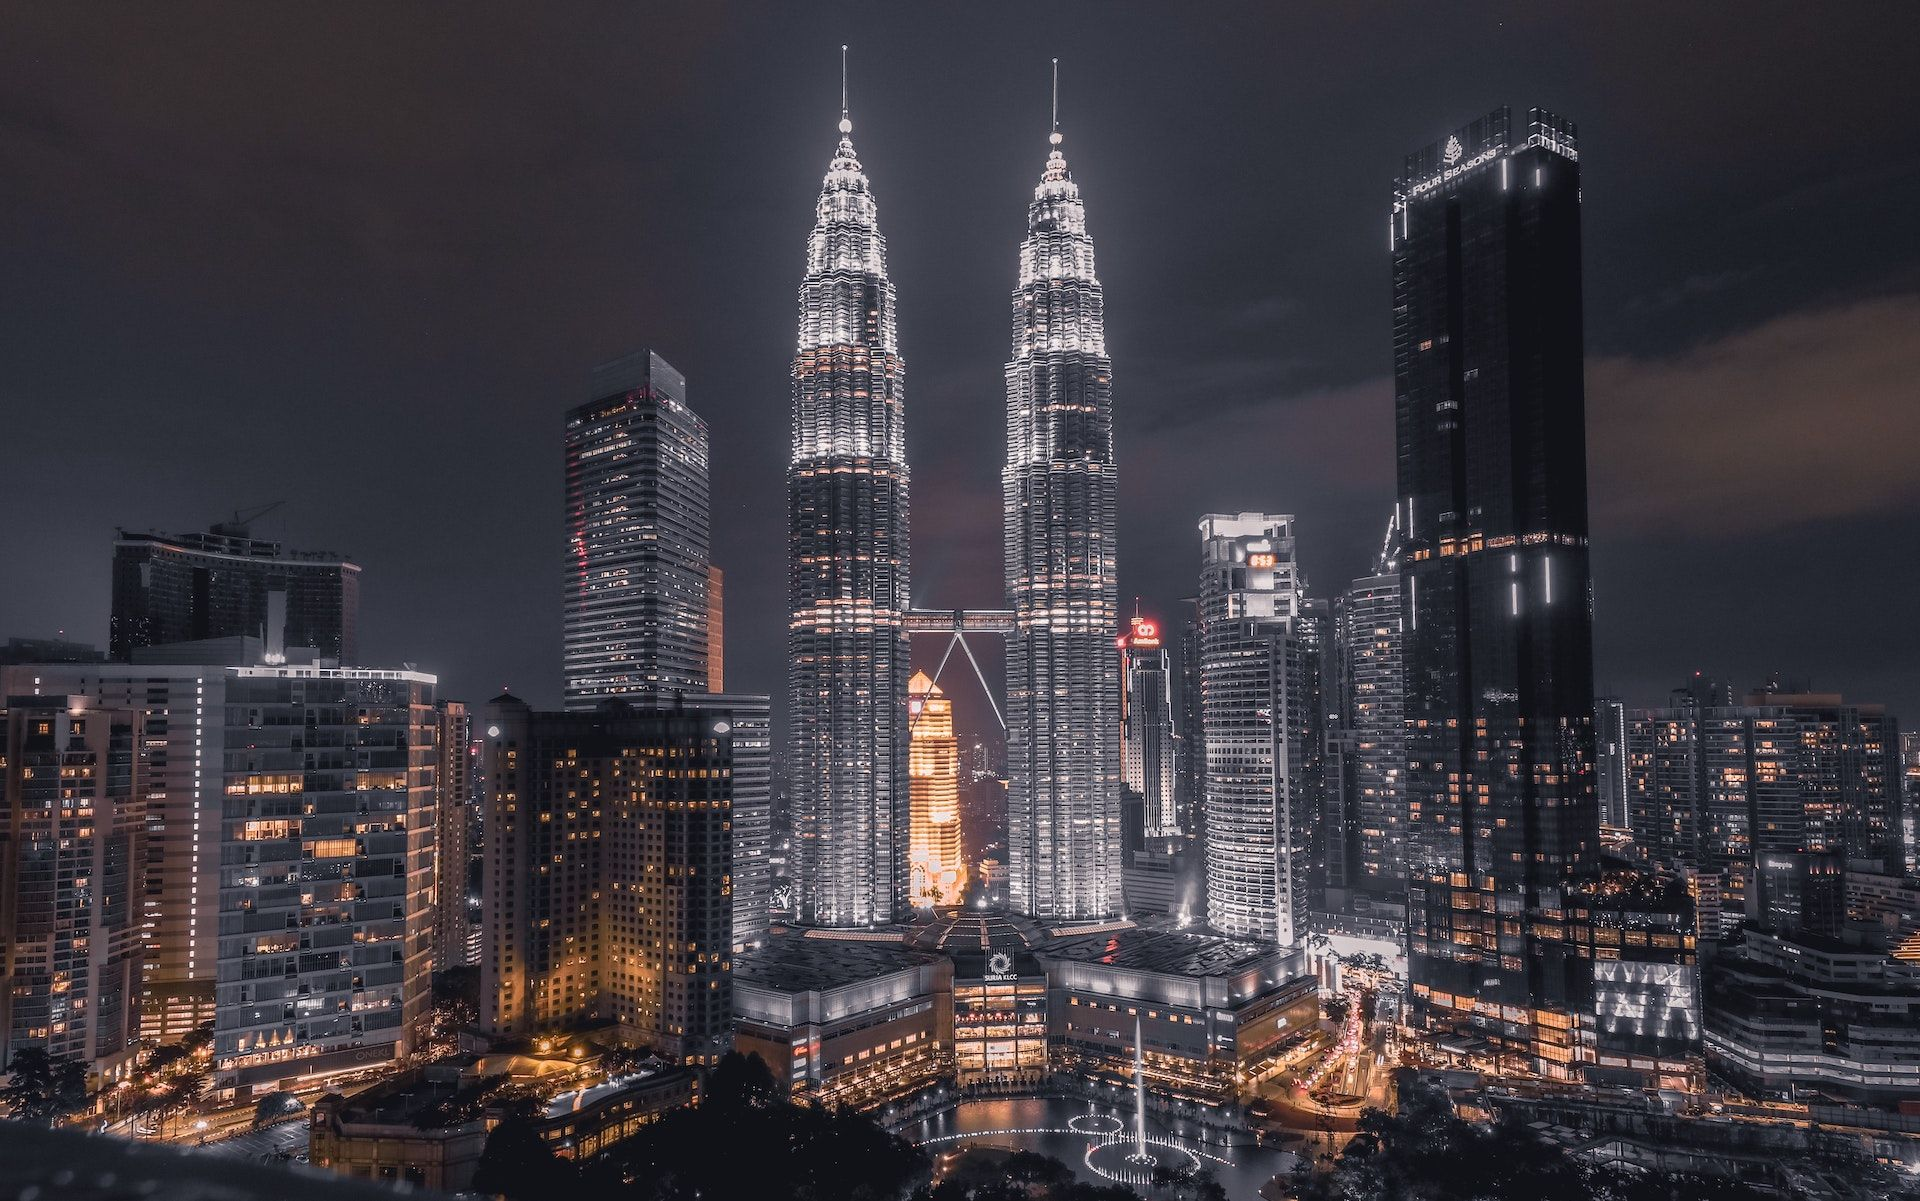 Photo: Umar Mukhtar/Pexels